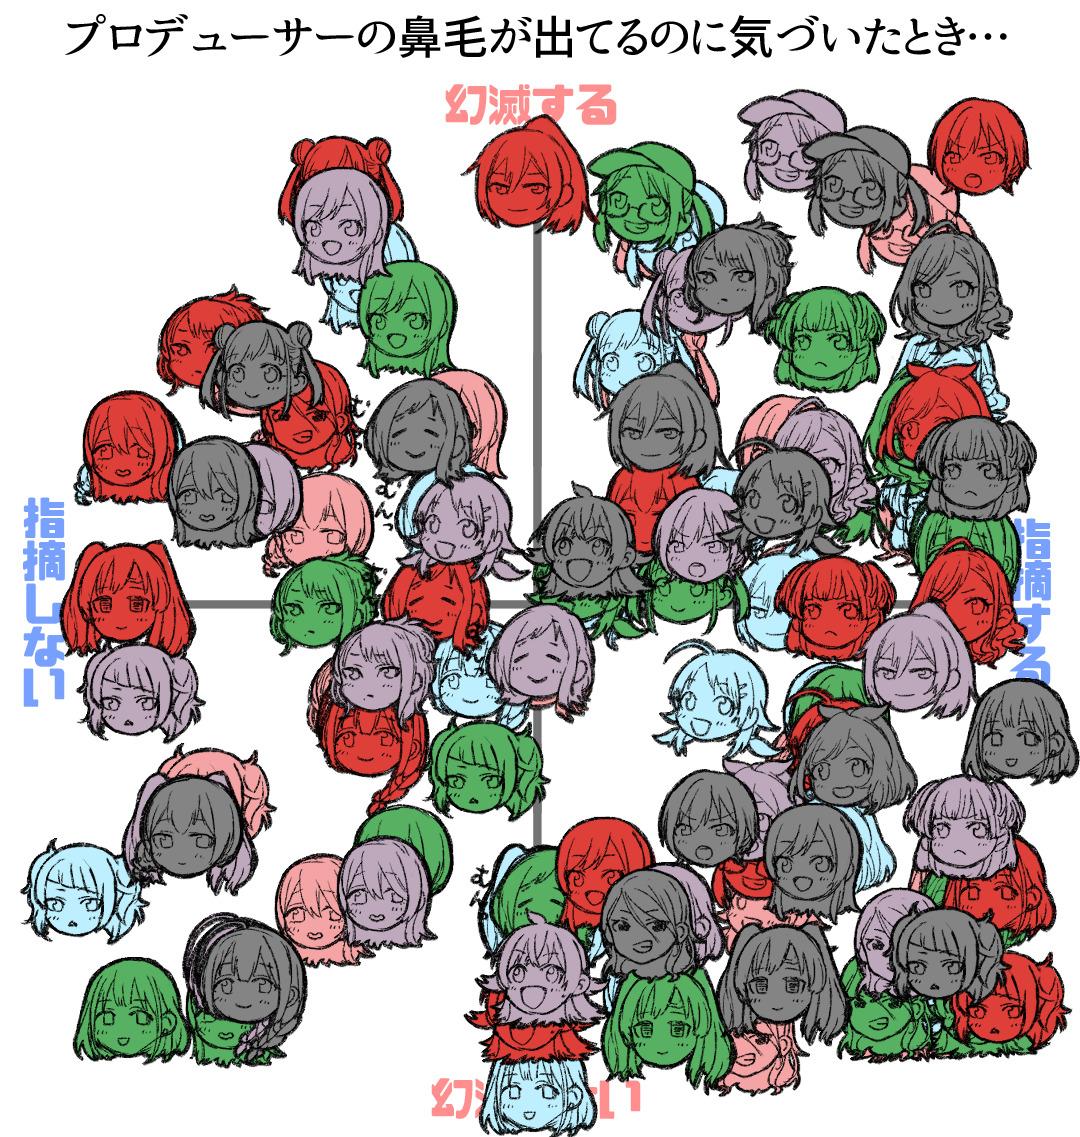 f:id:hoshi_sano:20200414105205j:image:w400